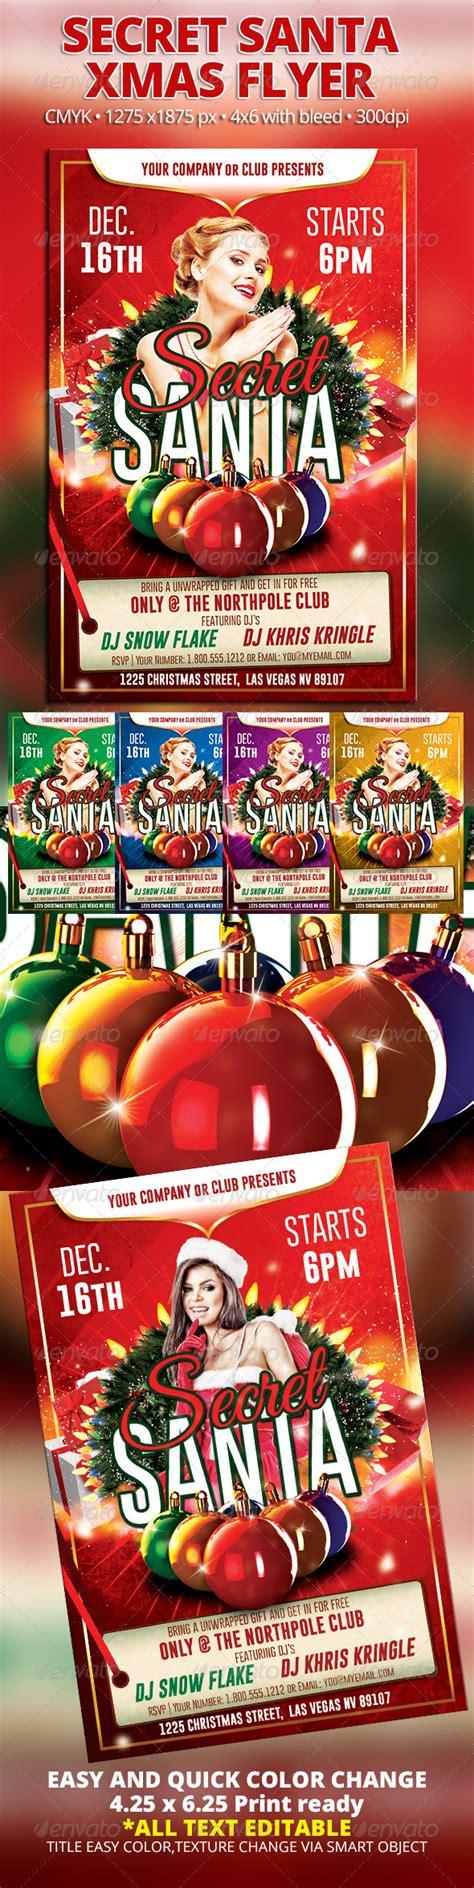 Secret Santa Xmas Flyer Graphicriver Secret Santa Flyer Templates